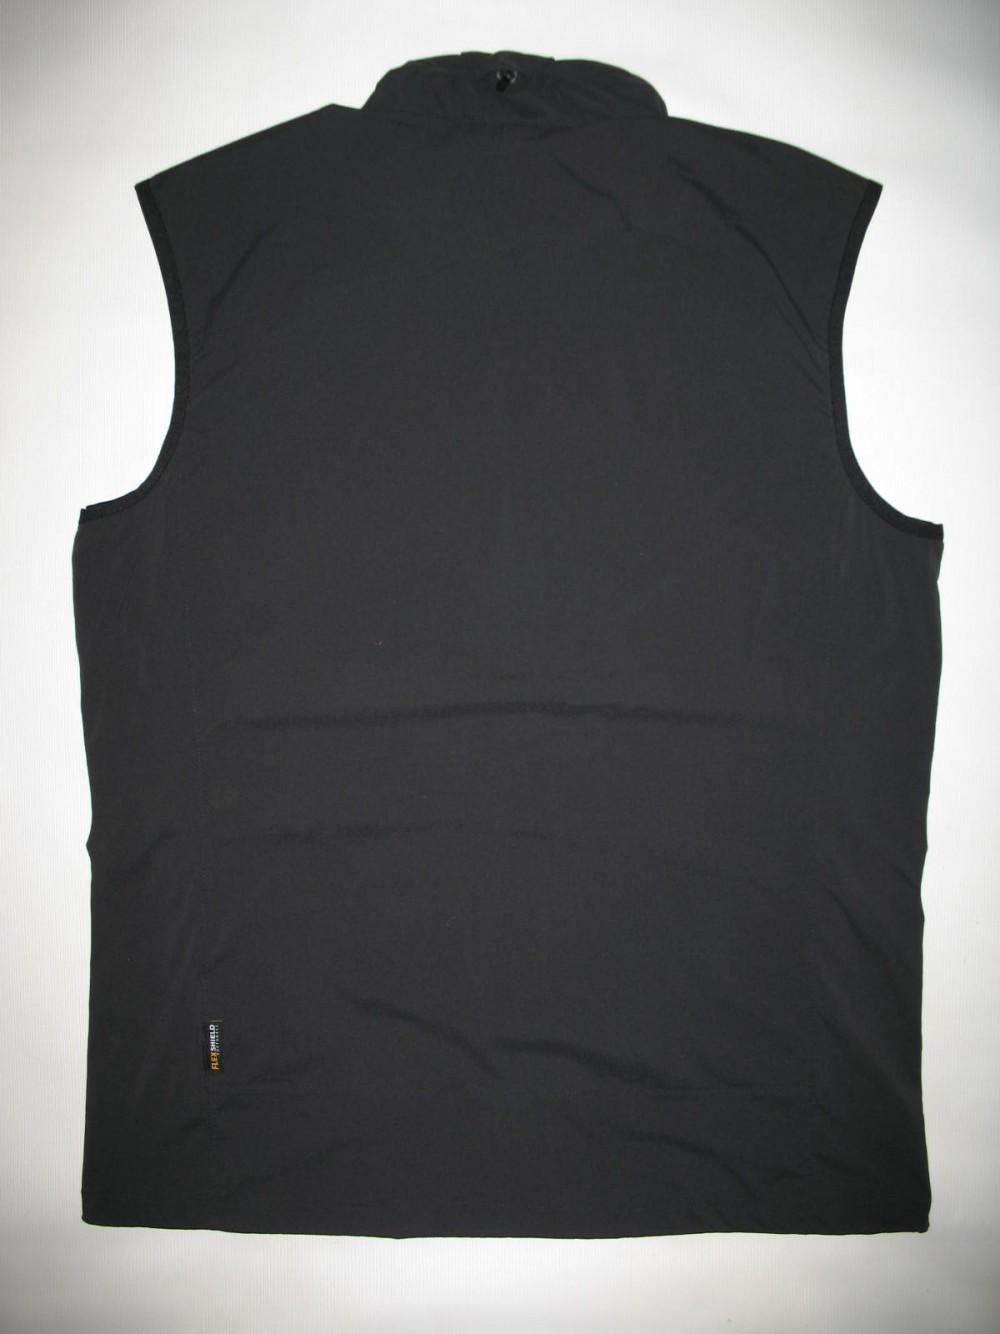 Жилет JACK WOLFSKIN activate softshell vest (размер XL) - 2